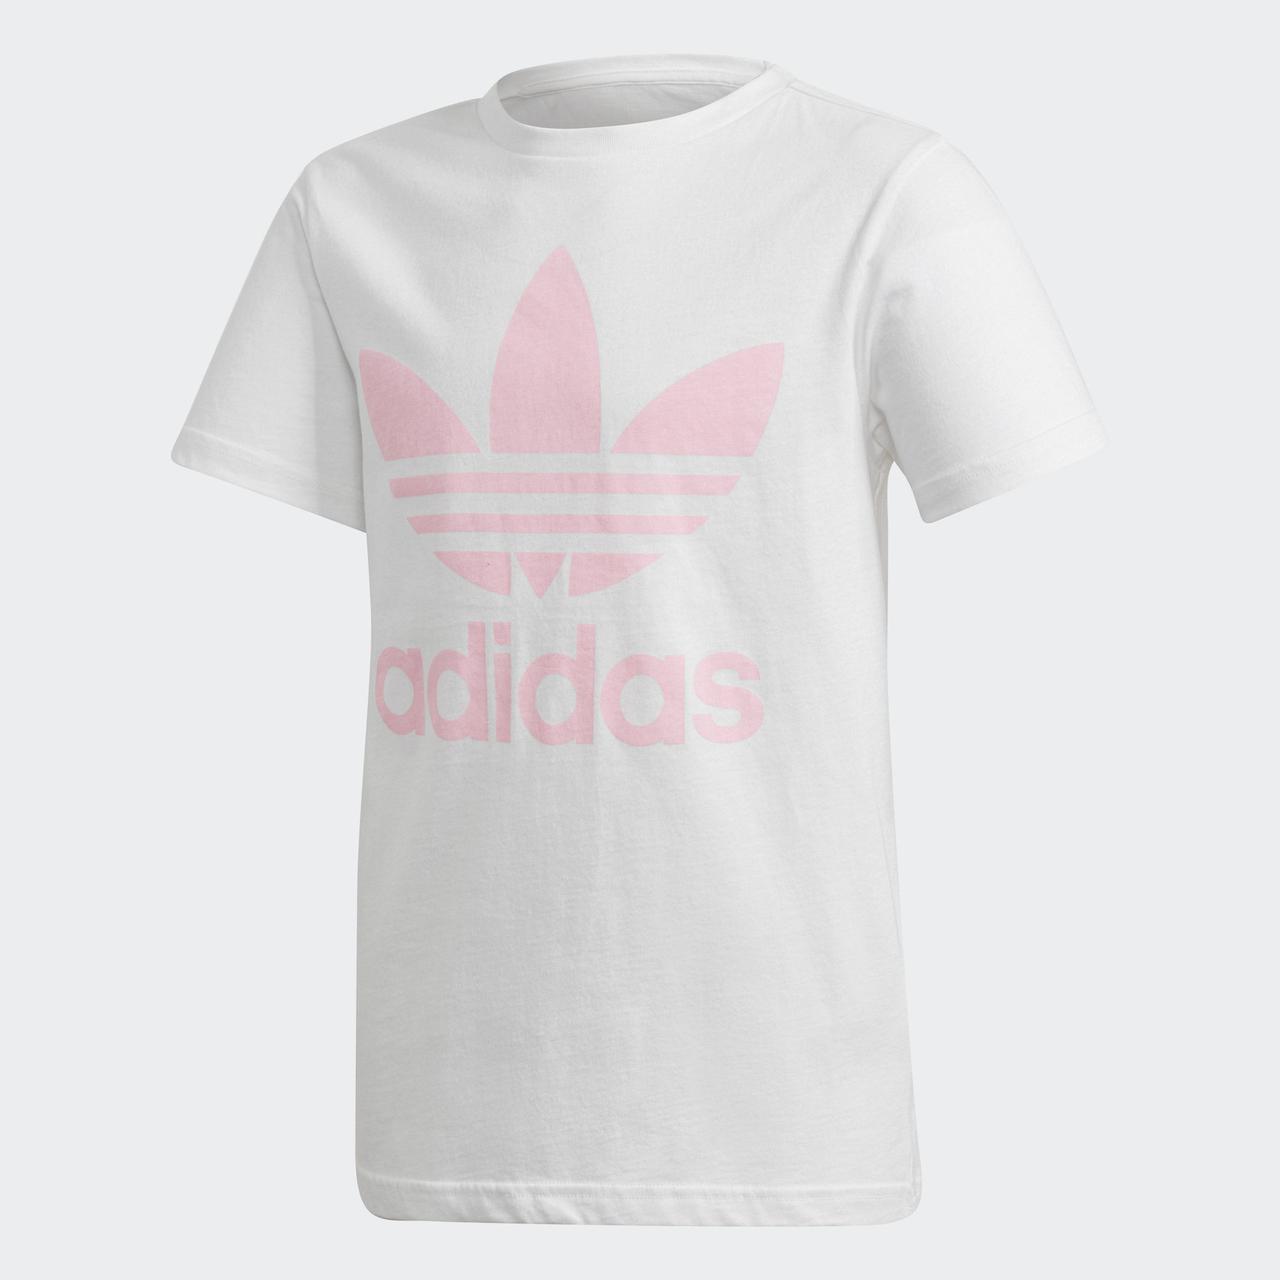 206b585b Детская футболка Adidas Originals Trefoil (Артикул: DH2475) -  Интернет-магазин «Эксперт